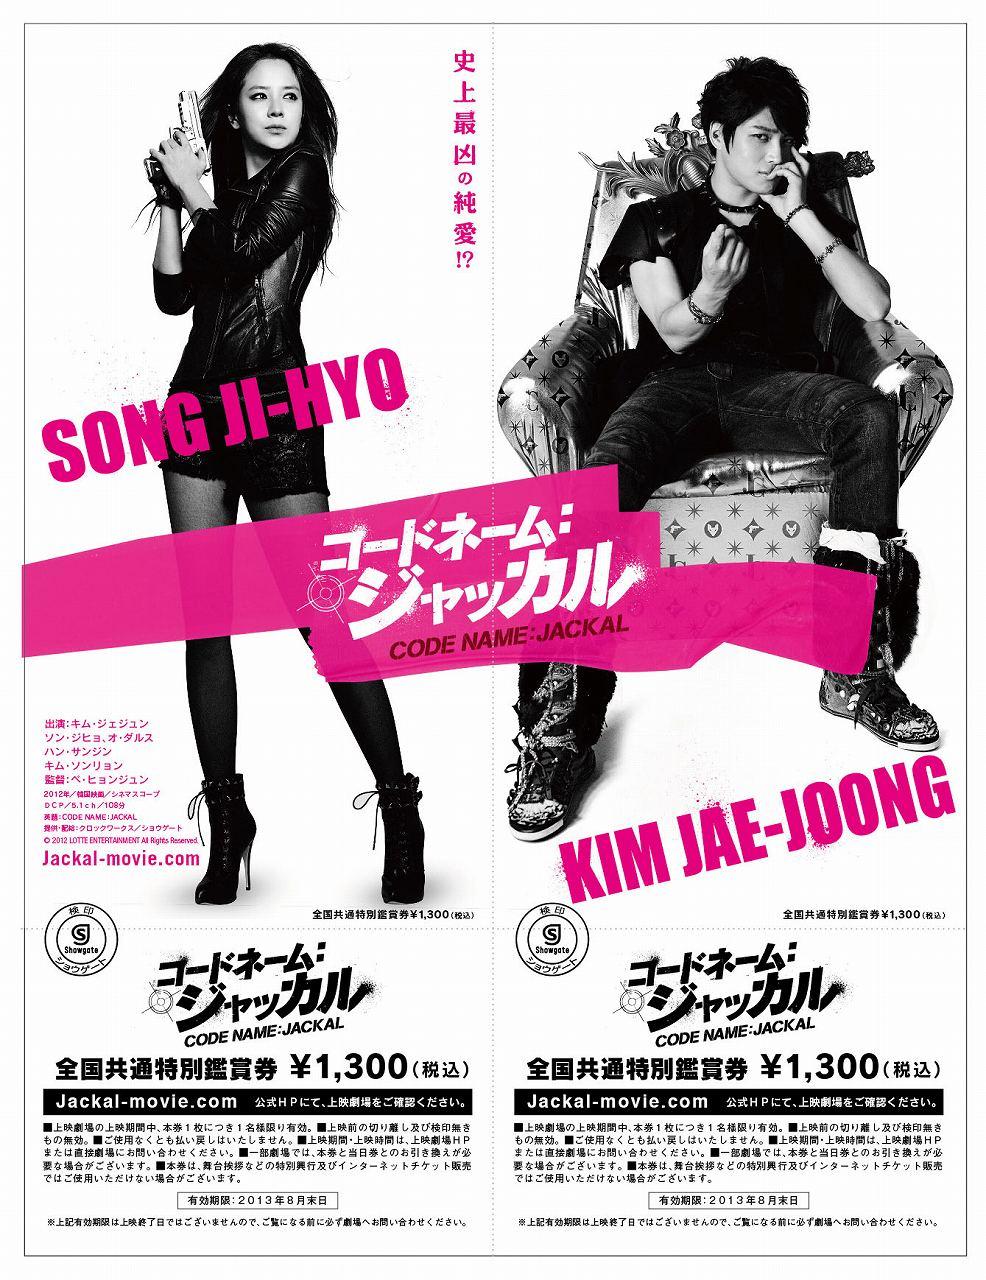 JYJのキム・ジェジュン初主演映画「コードネーム:ジャッカル」特製A5クリアファイル2枚セット付前売ペア券発売決定